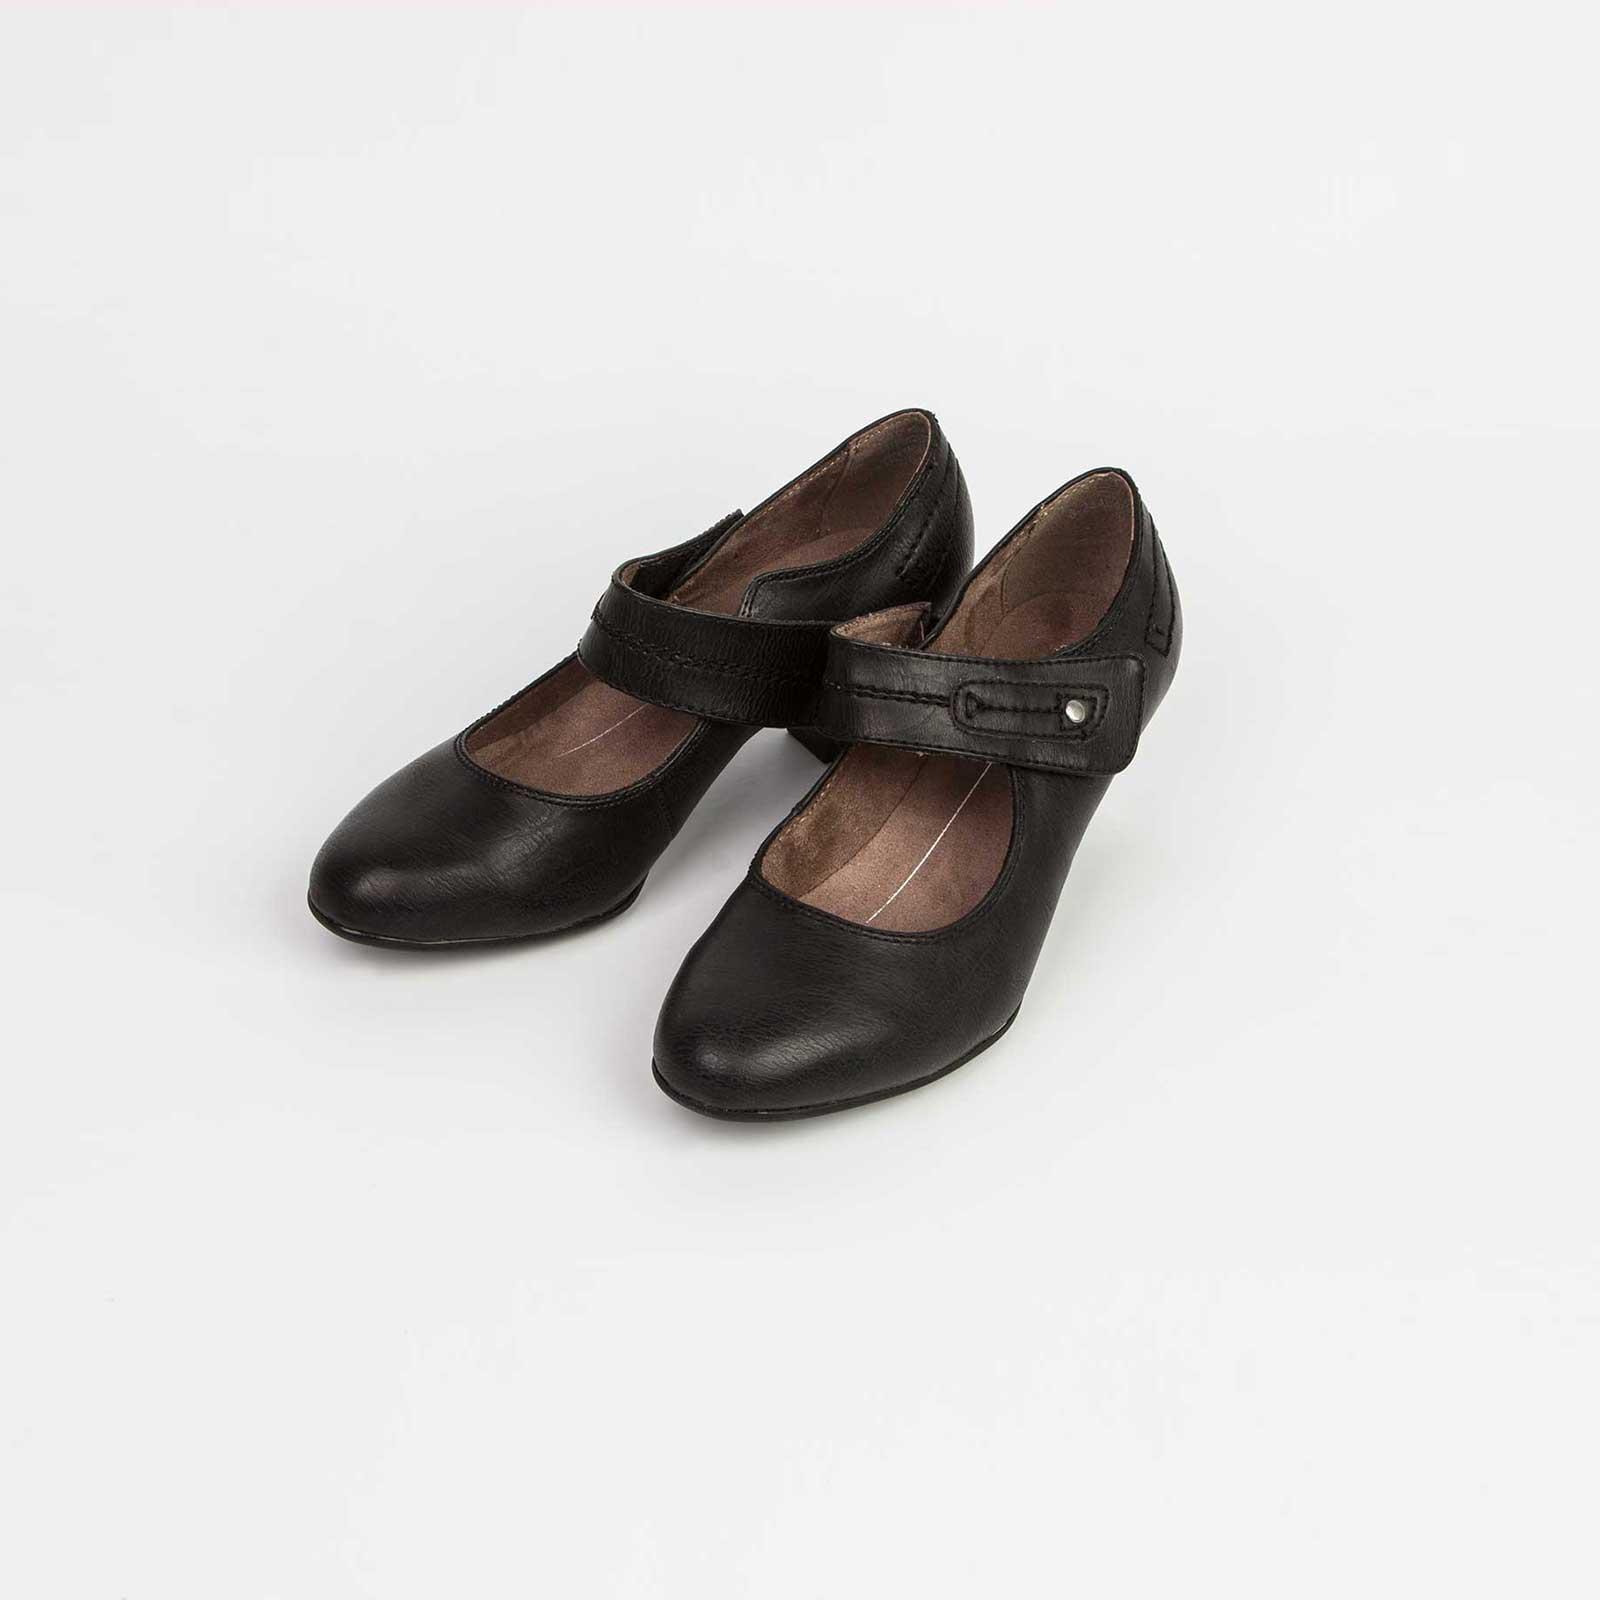 Женские туфли на удобном каблуке с ремешком